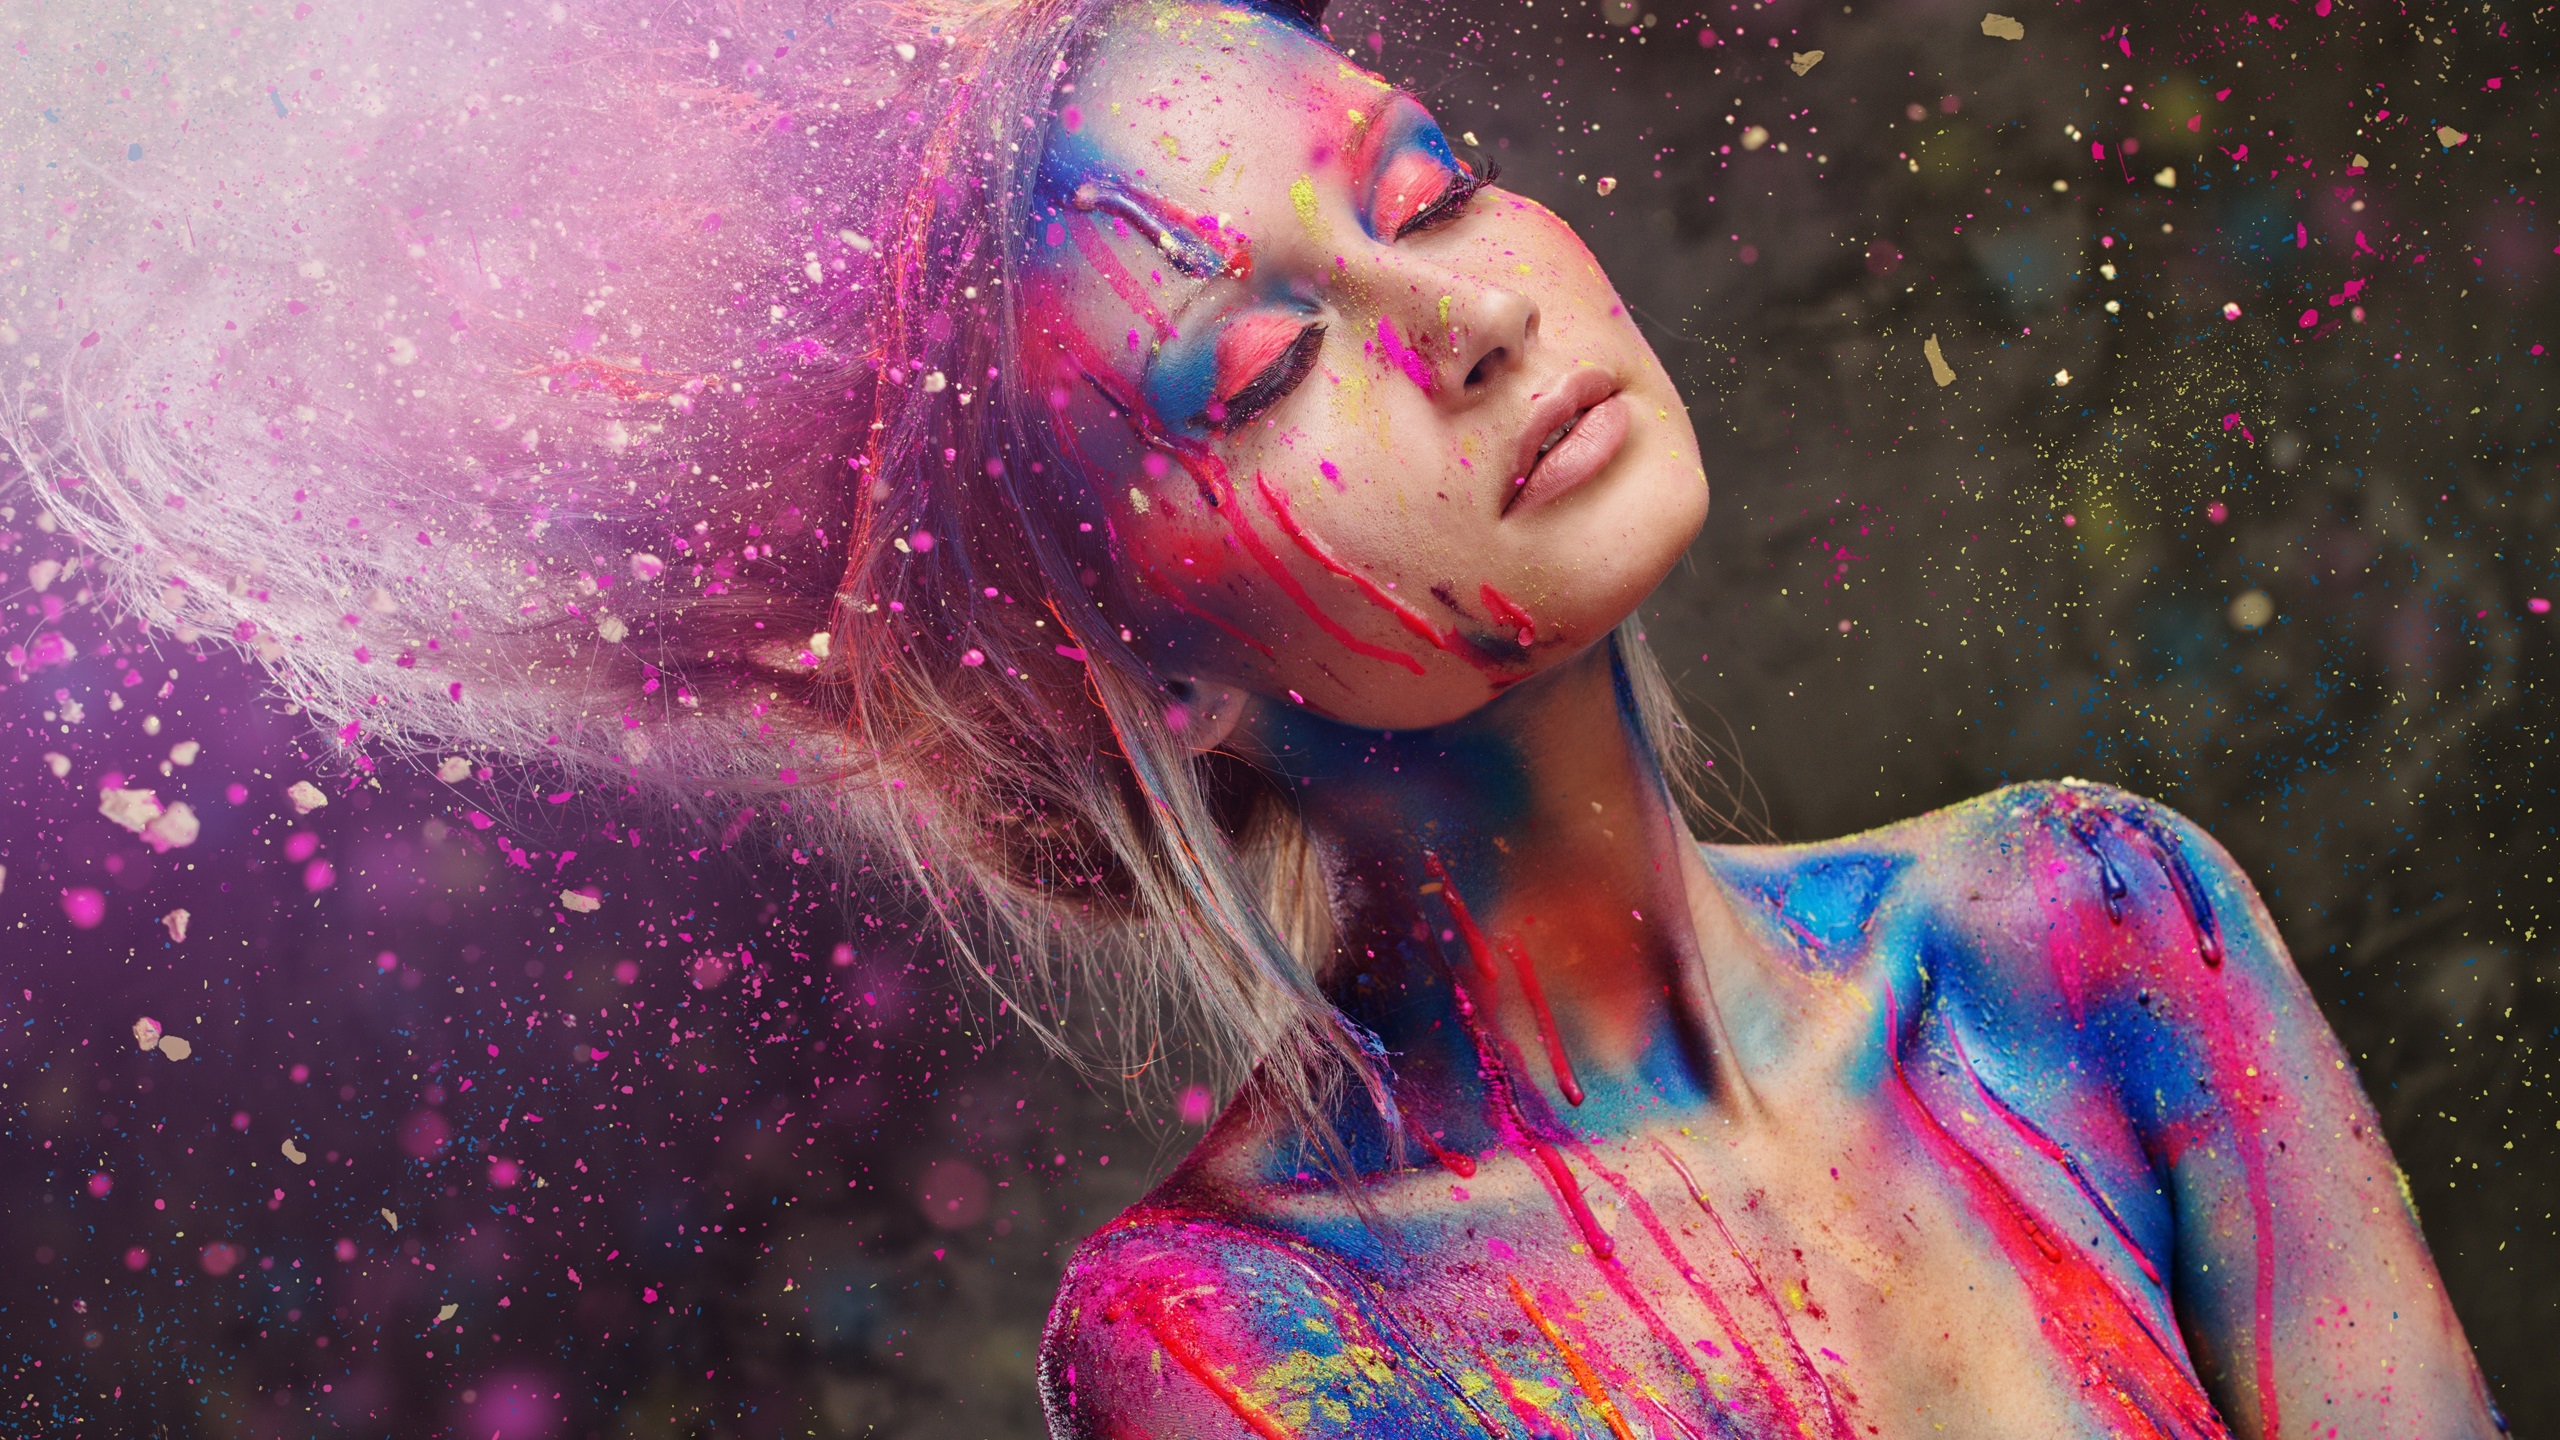 Wallpaper Beautiful Girl Fashion Style Paint Colorful